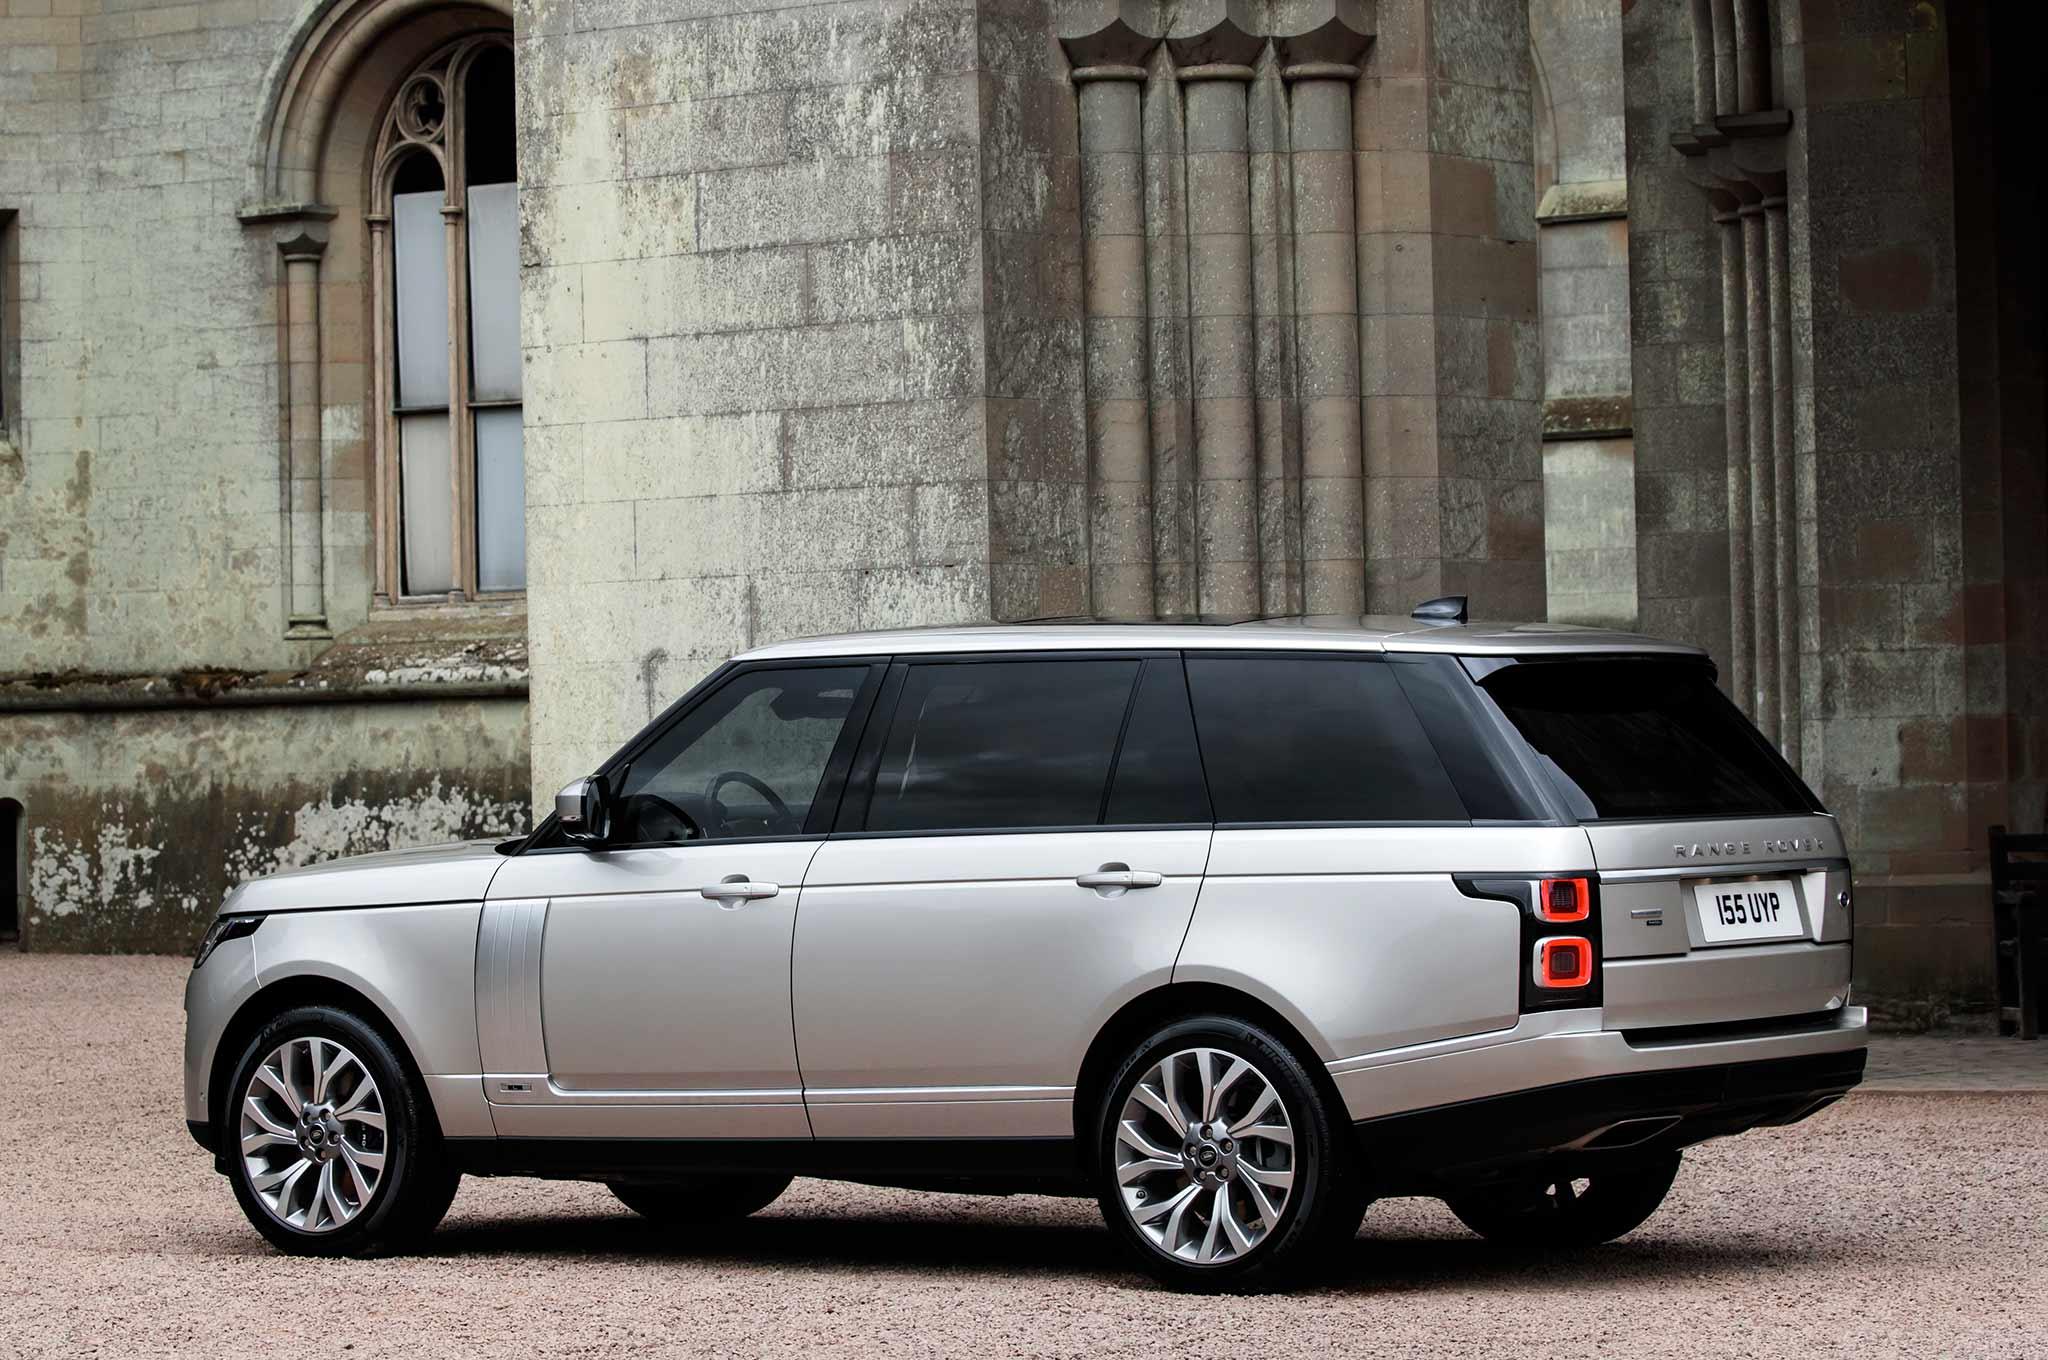 Range Rover Debuts P400e Plug In Hybrid Due for 2019